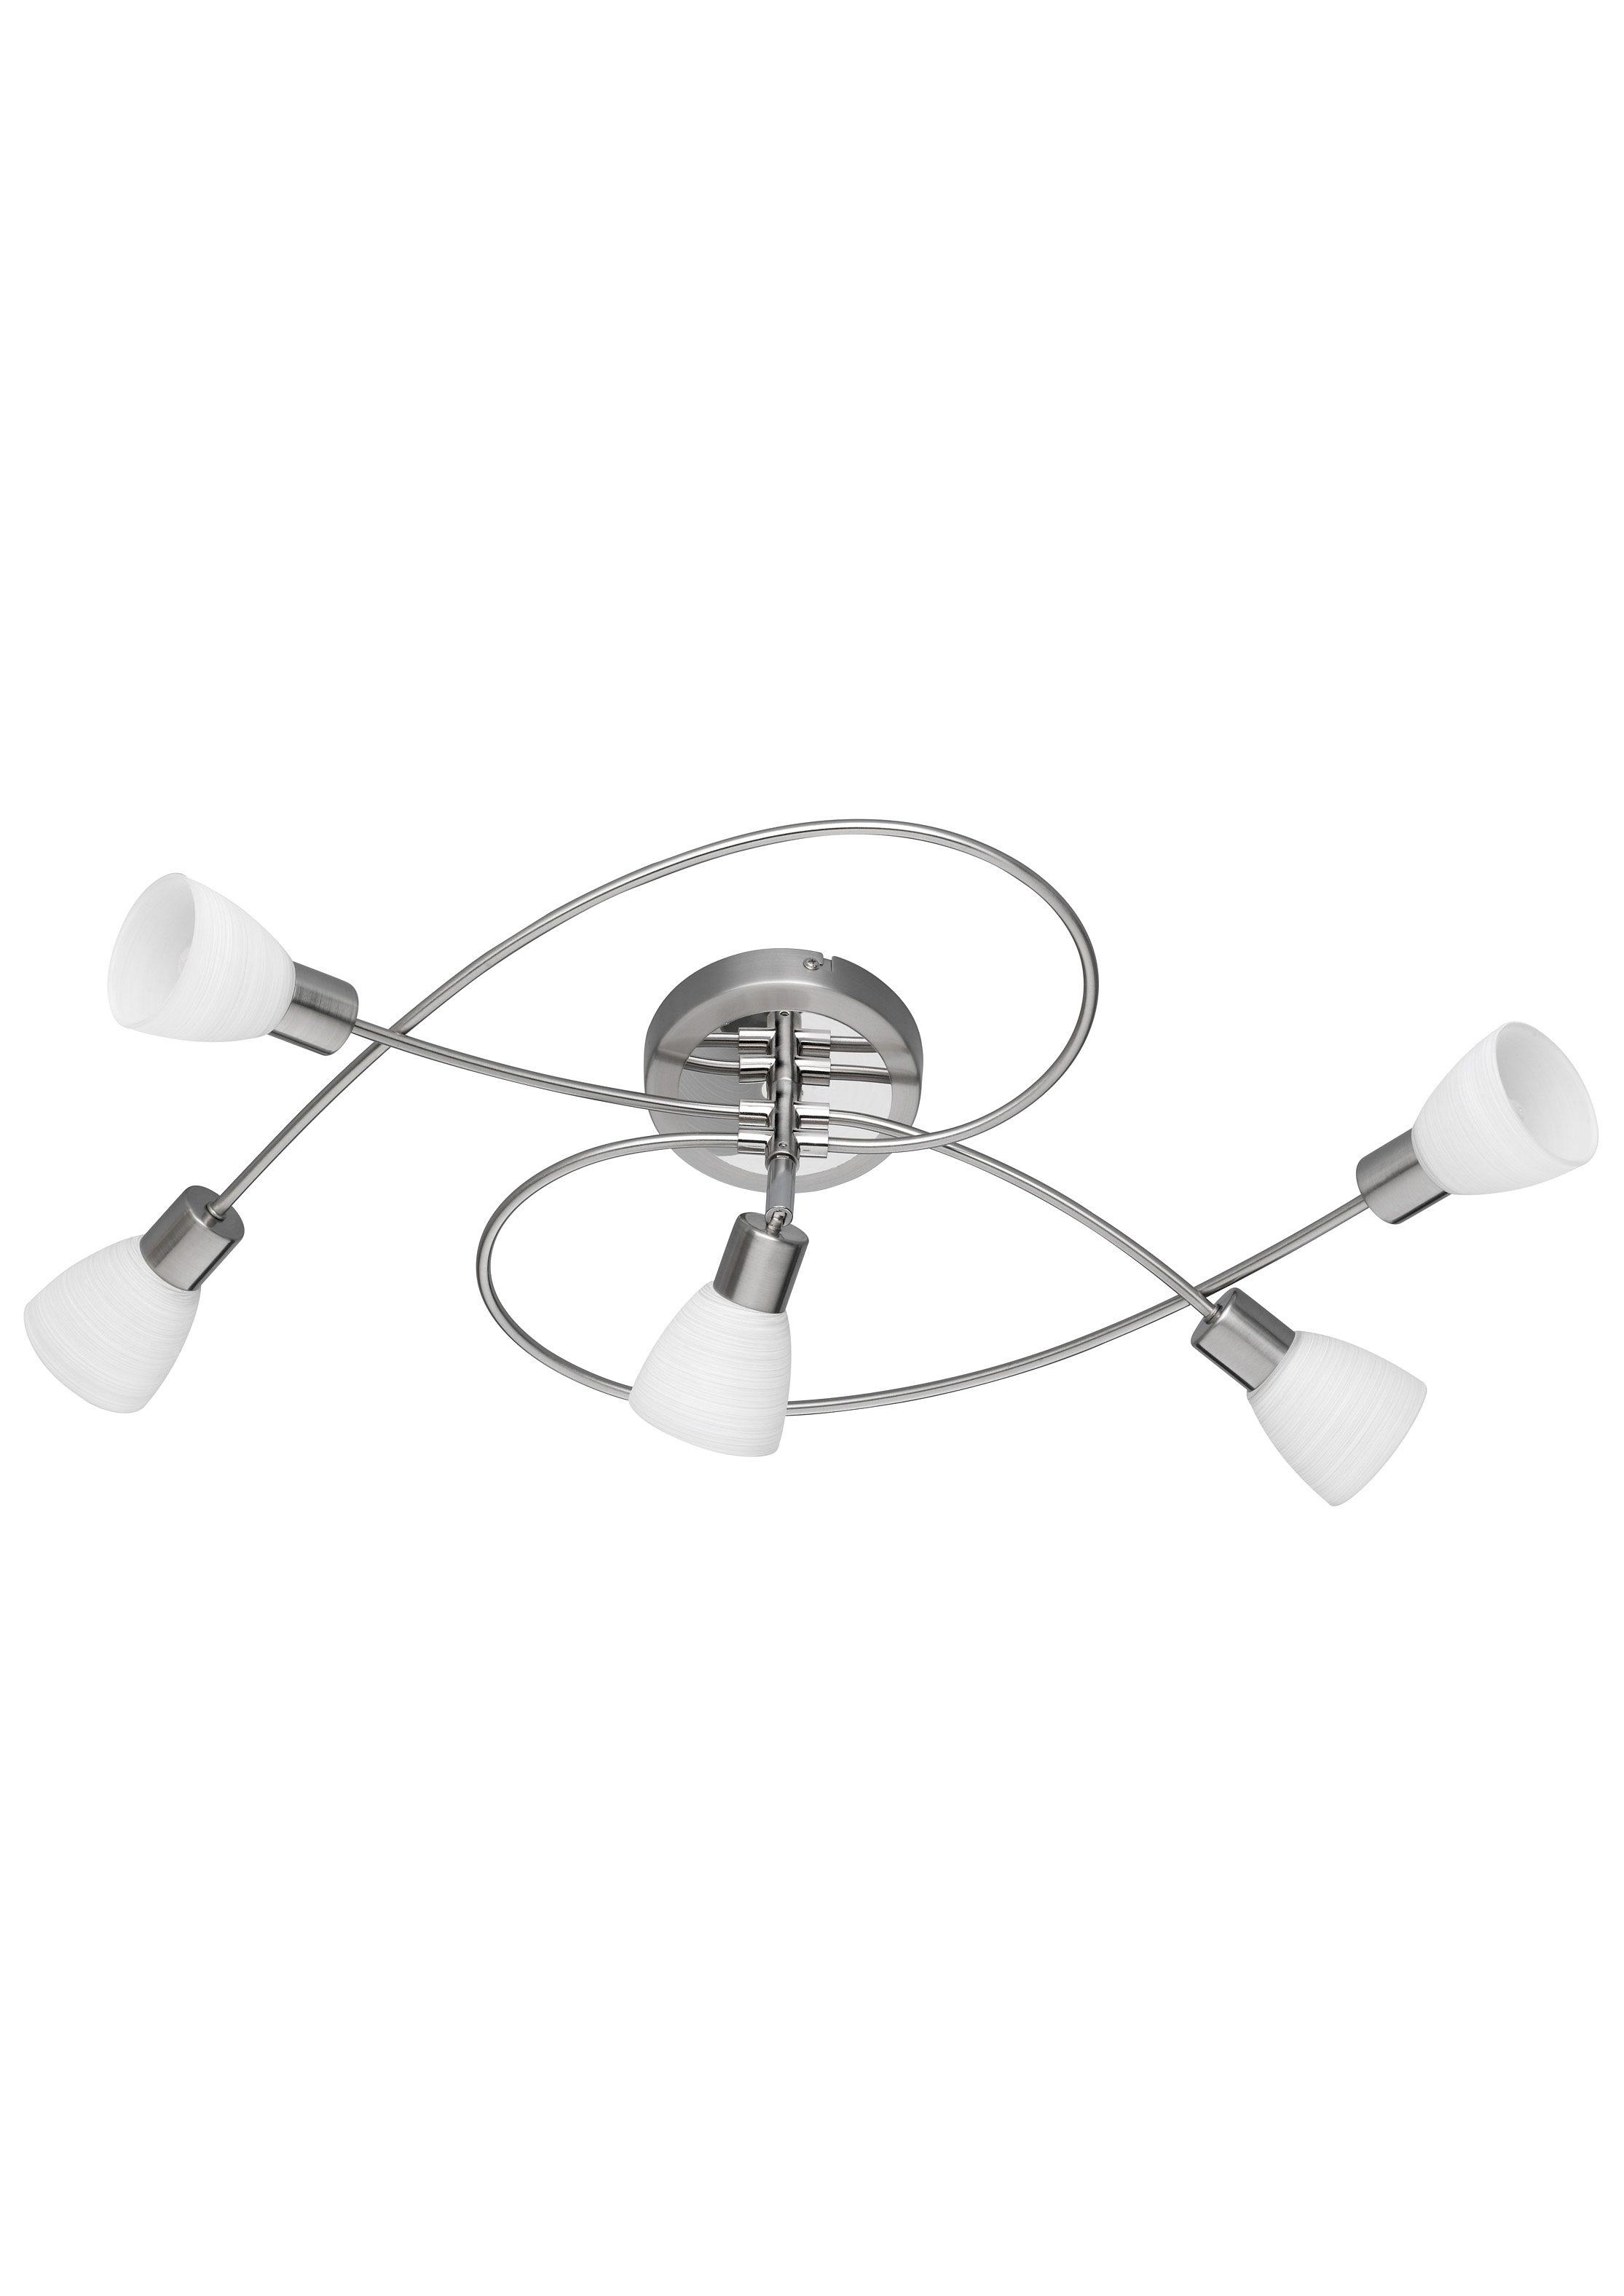 Trio LED-Deckenleuchte, 5flg., »CARICO«